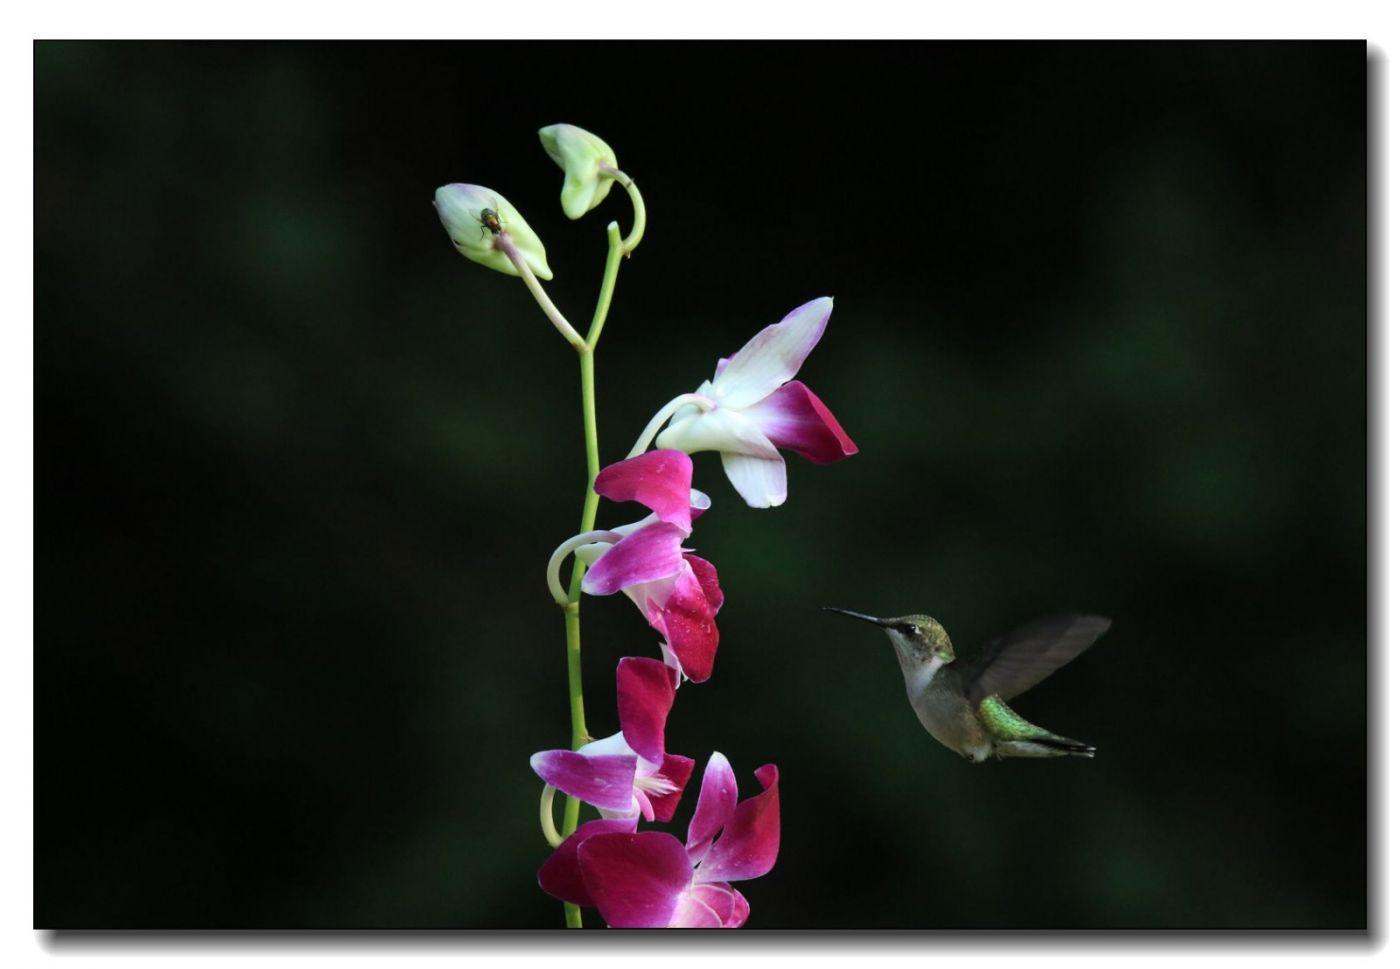 蜂鸟组图(五)_图1-1